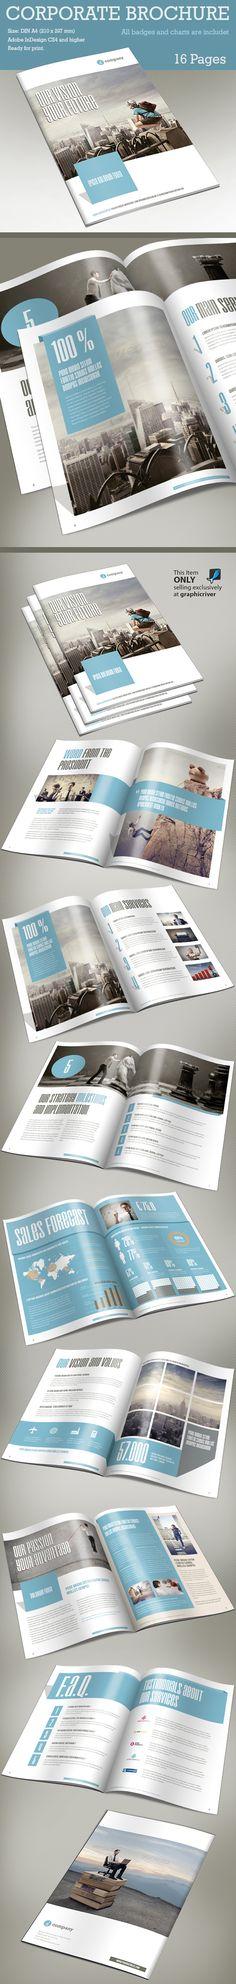 Corporate Brochure  #brochuredesign #corporatebrochure #booklets #annualresports #brochuretemplates #catalogdesign